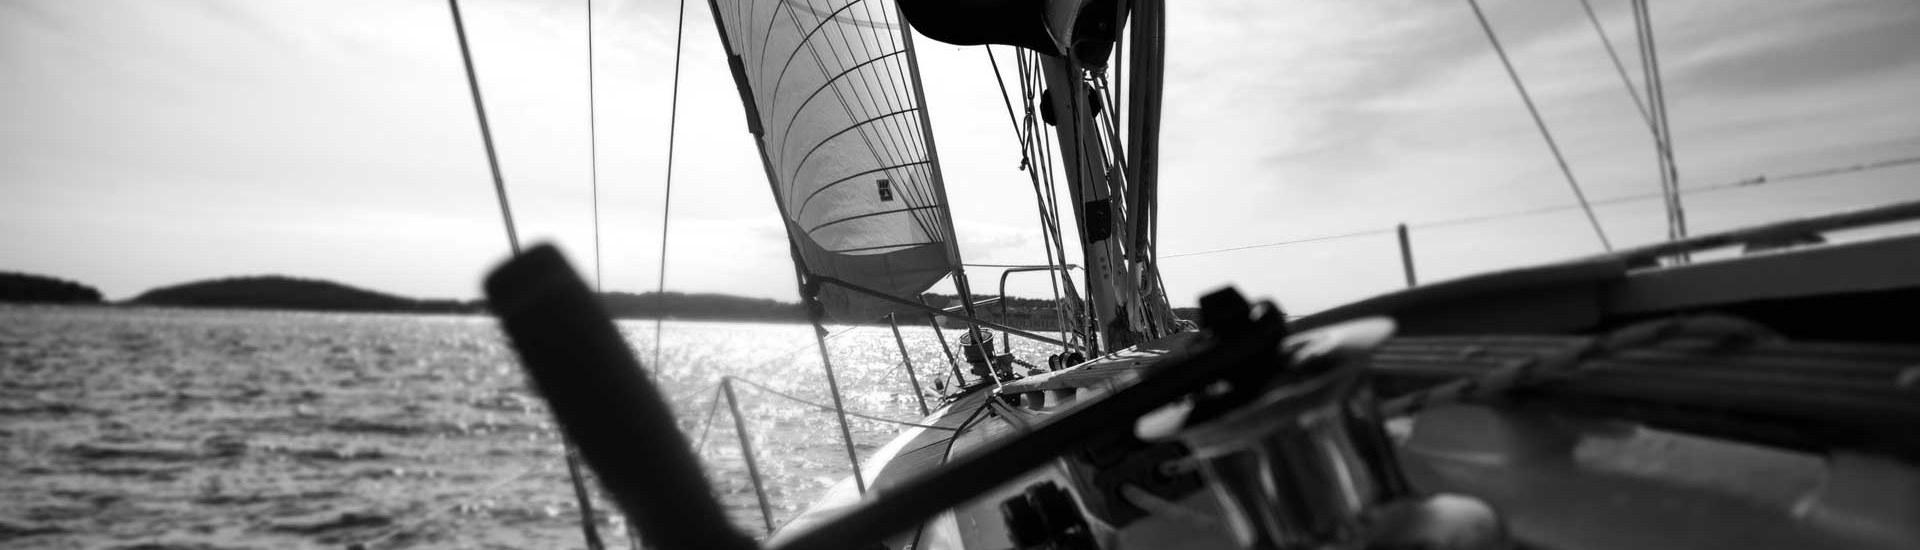 naval-plaisance-image